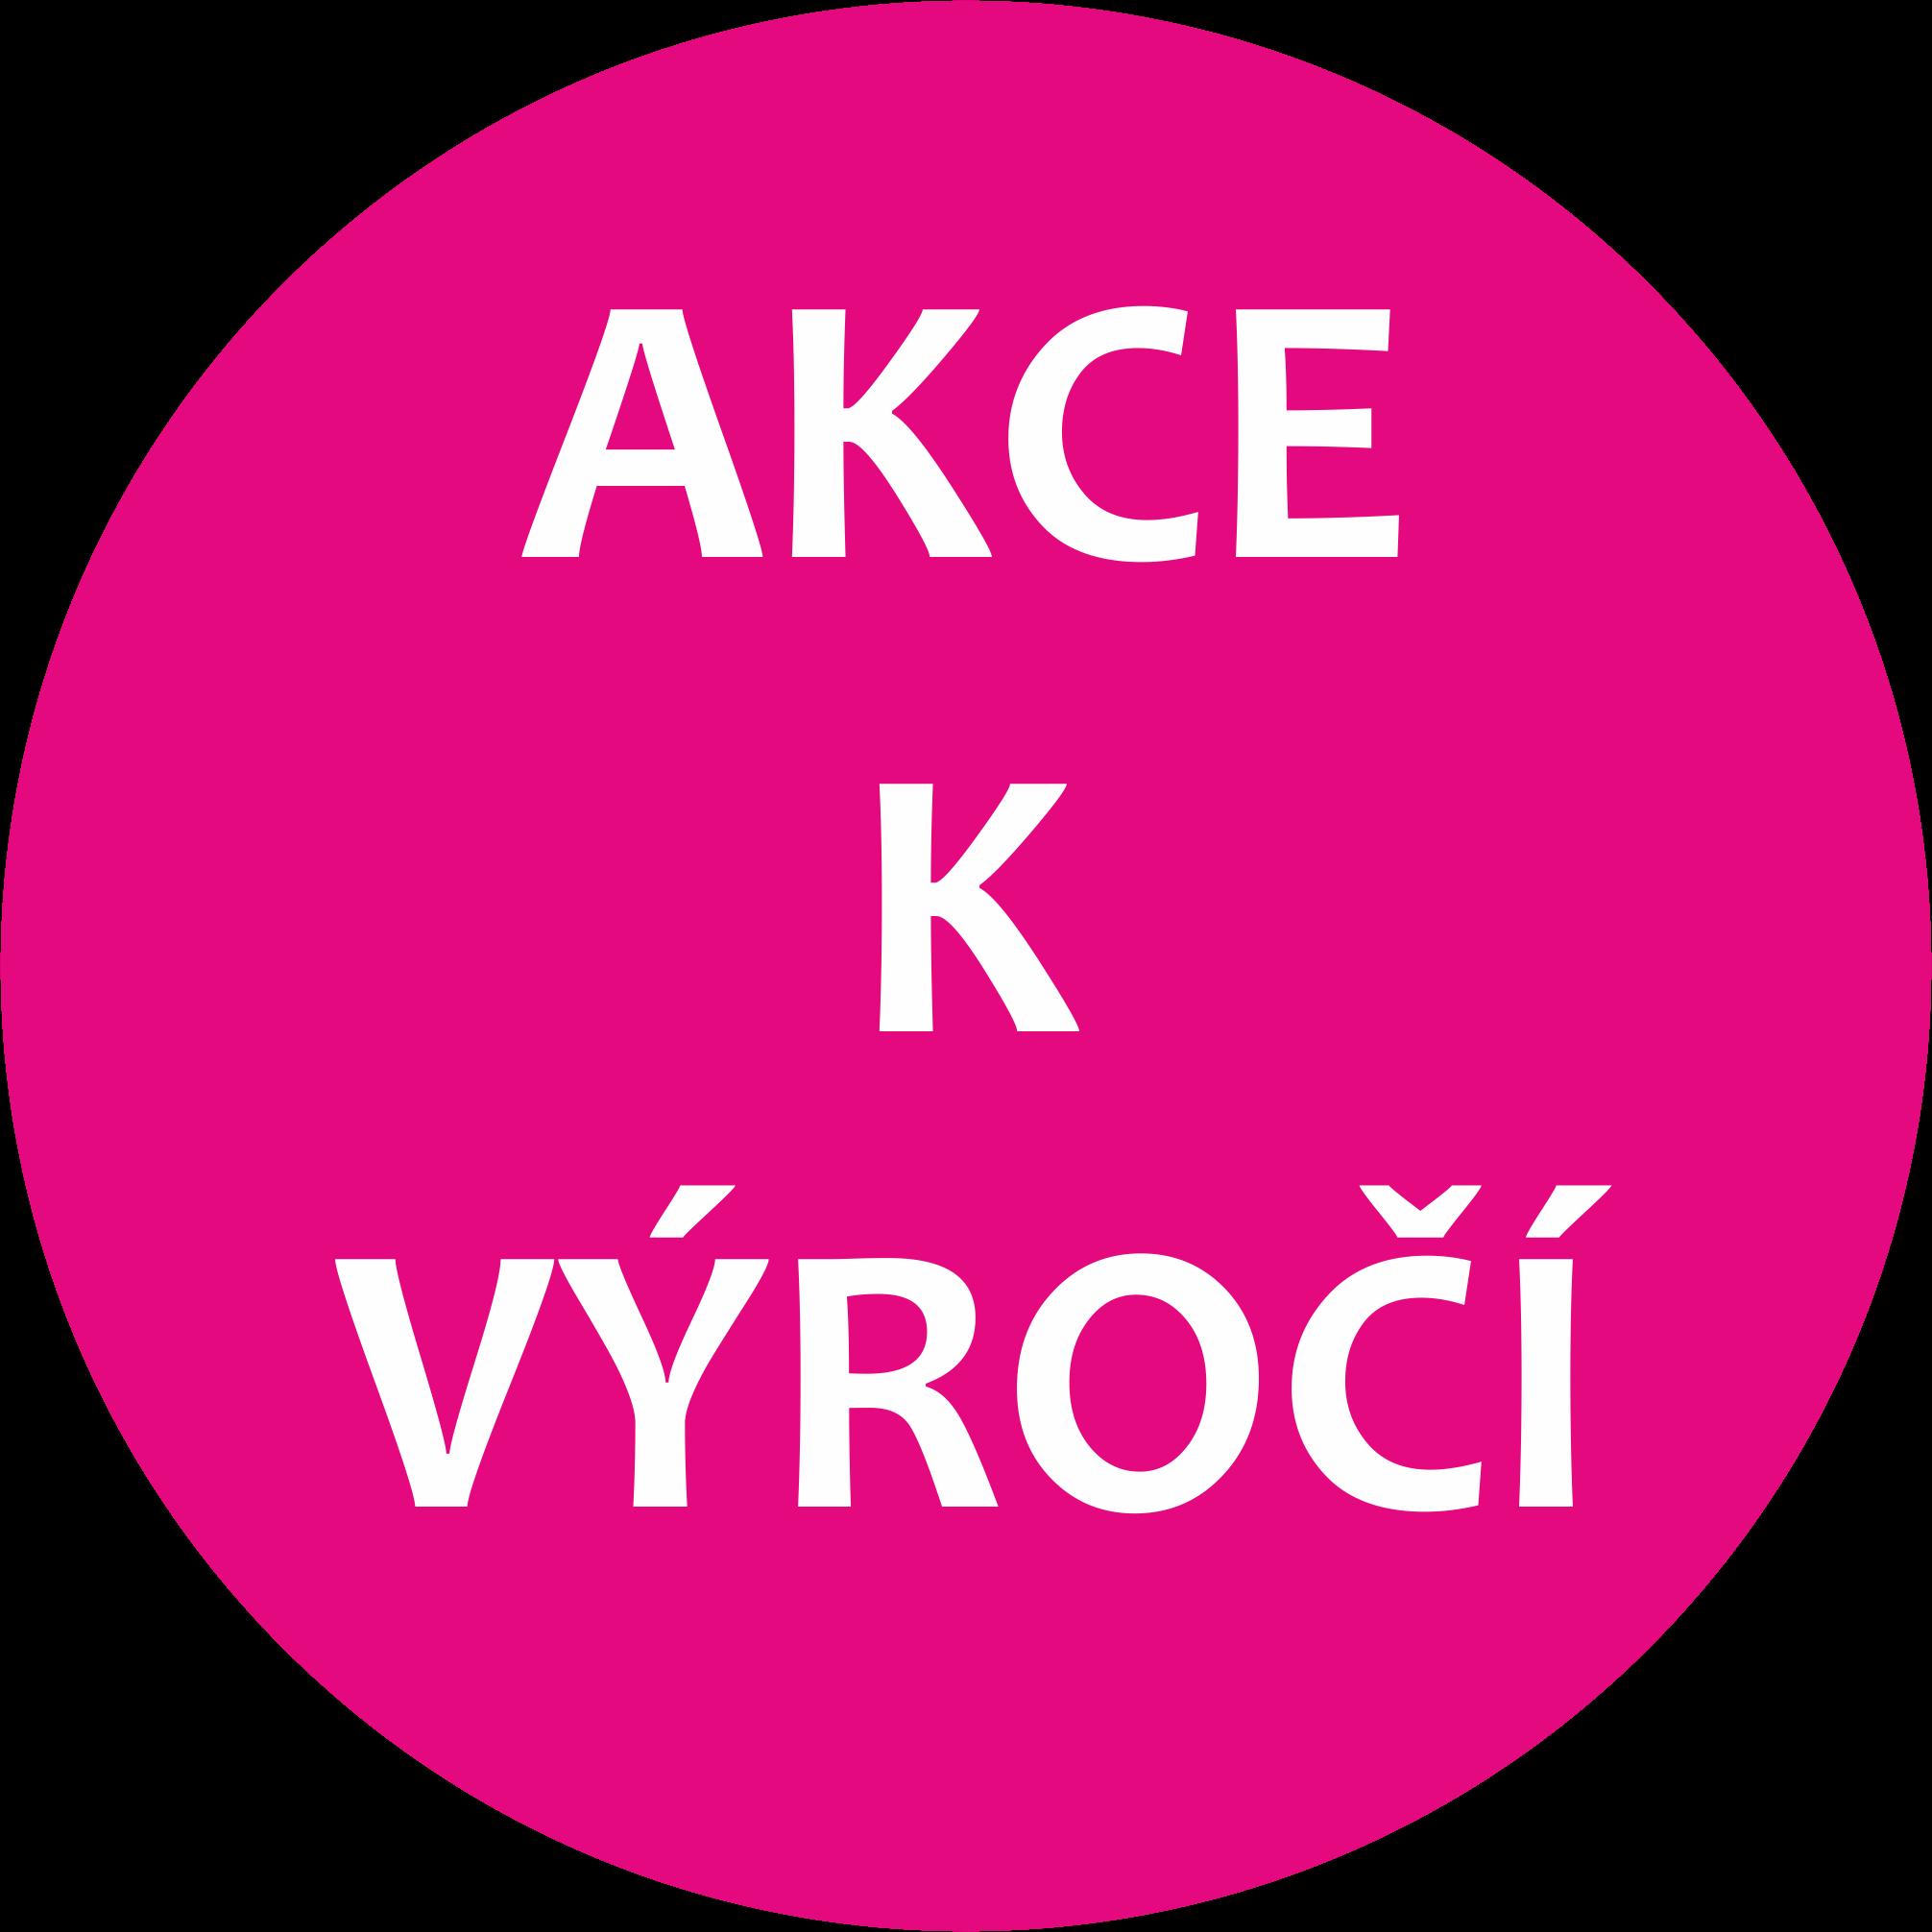 10LETZNACKY_WEB_KOLEKCKO_KATALOGY_akcekvyroci